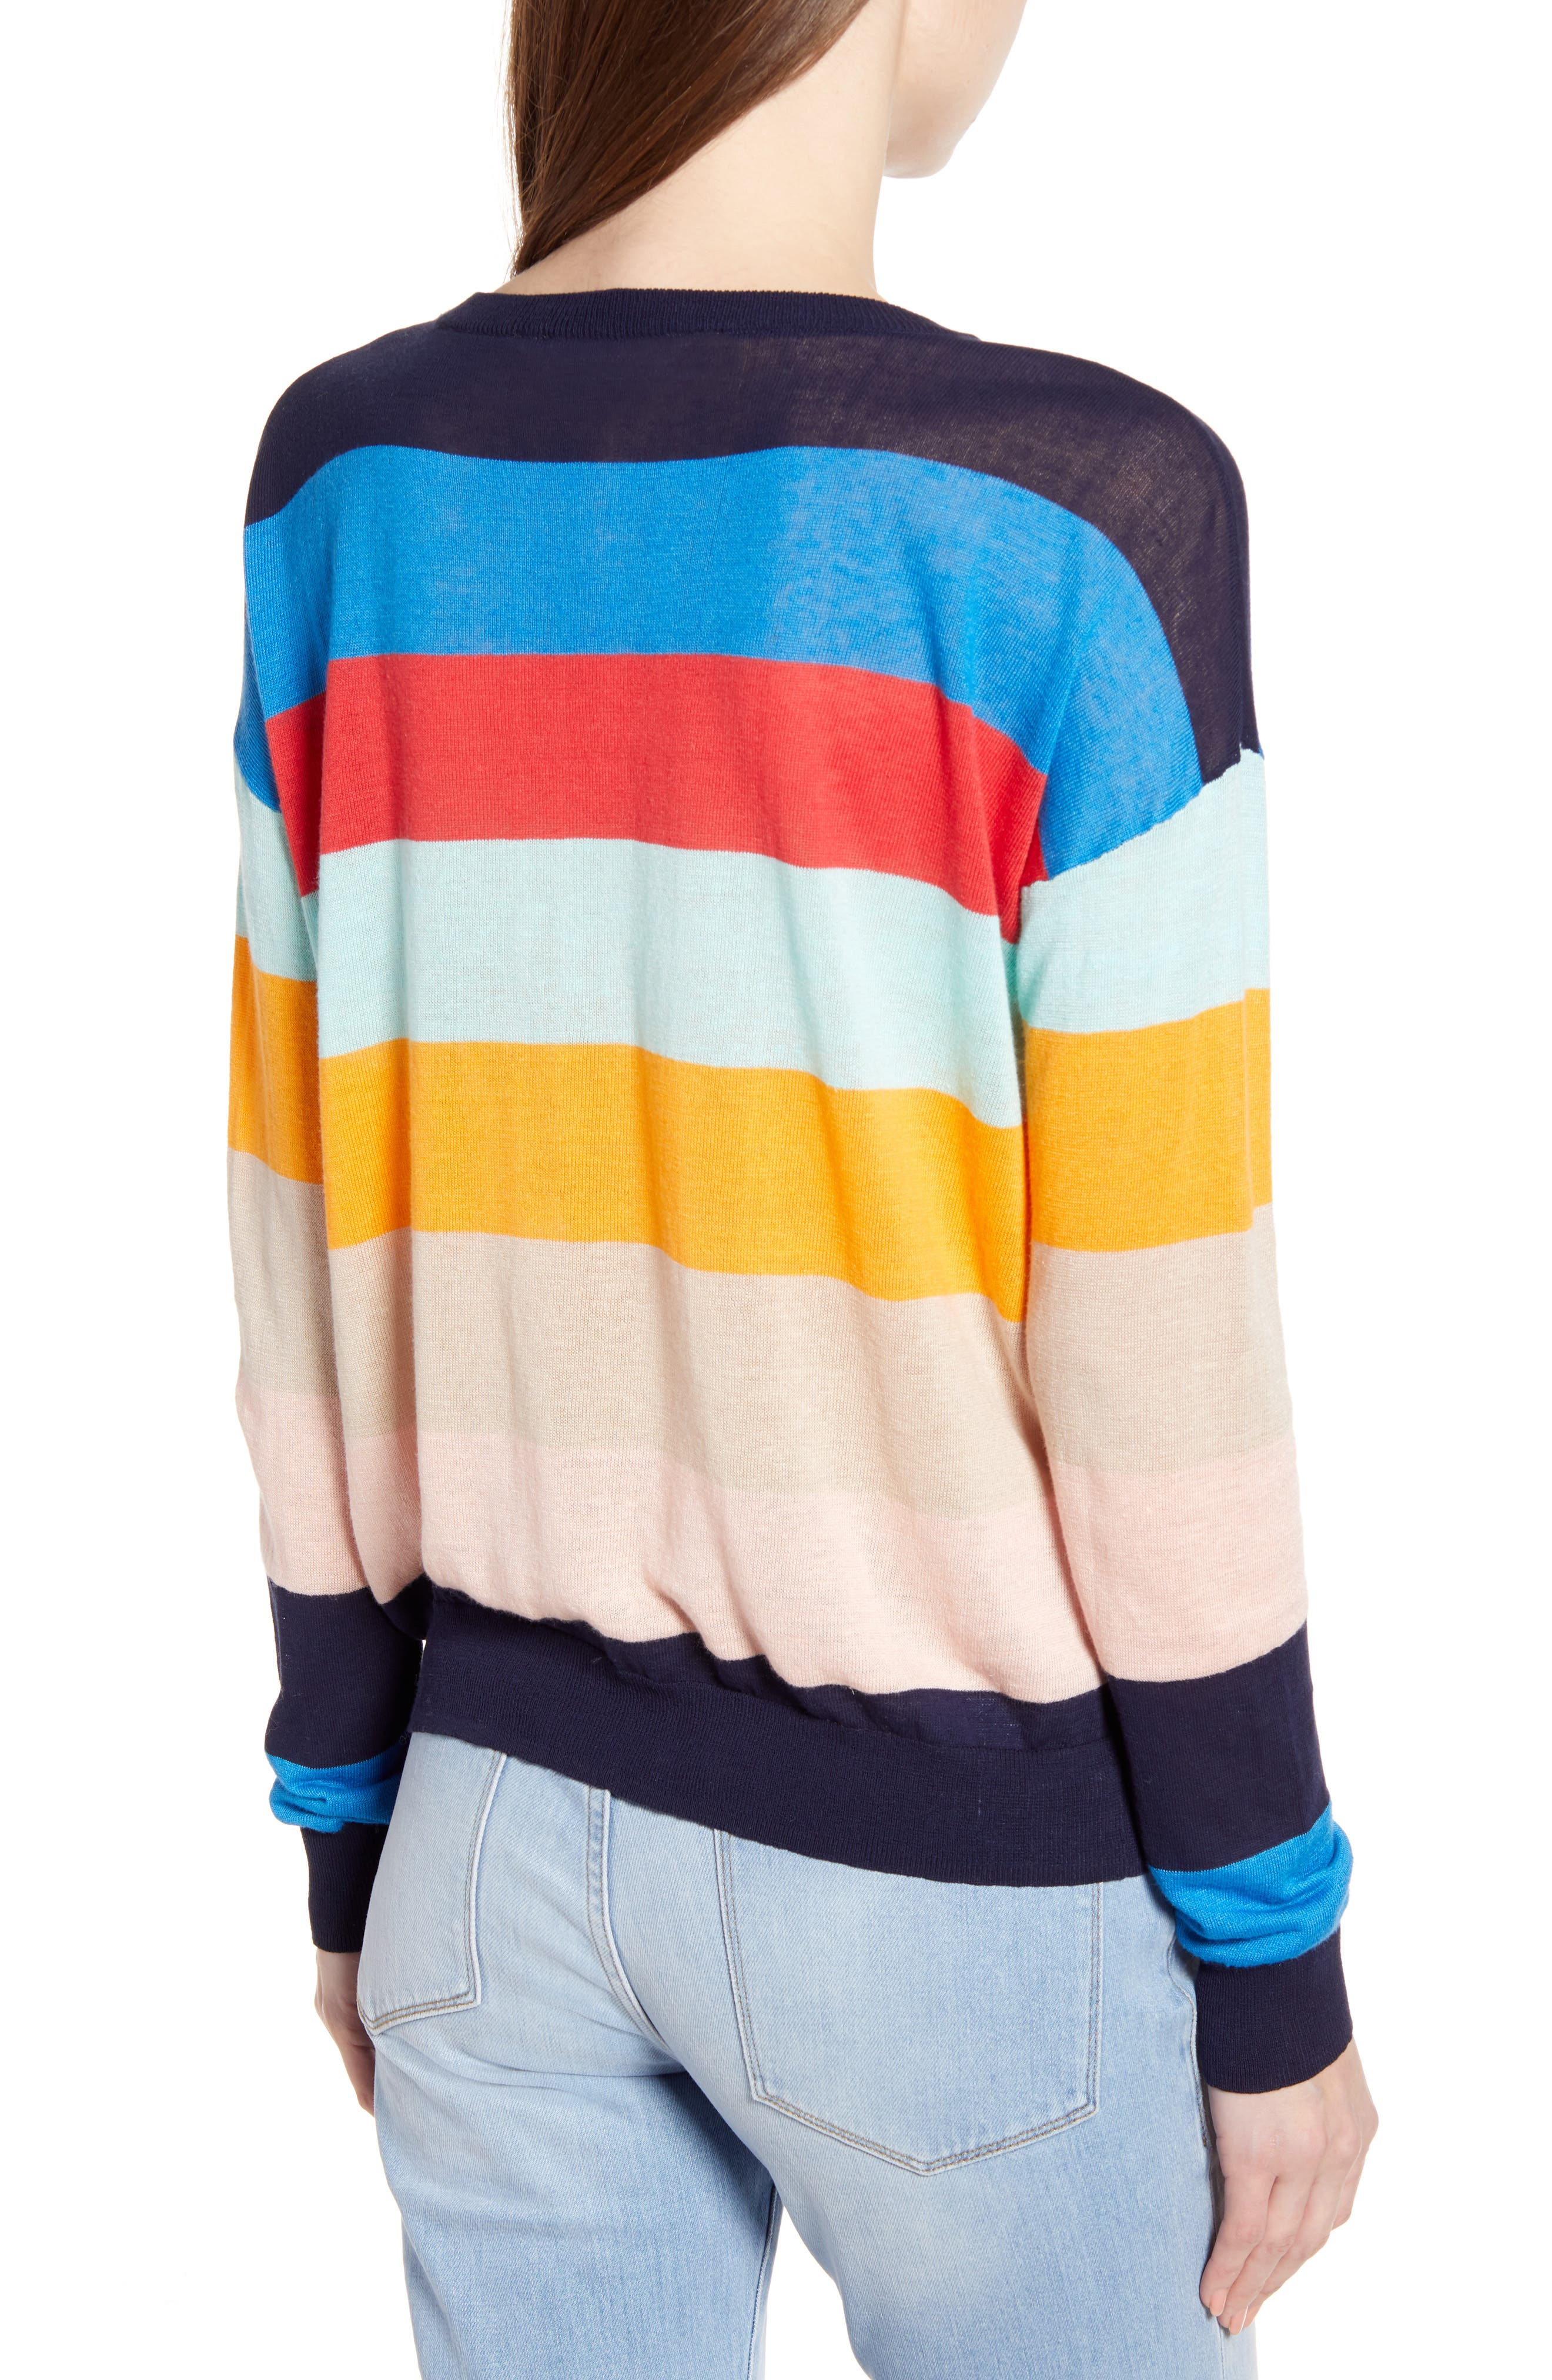 SPLENDID, Sunray Colorblock Sweater, Alternate thumbnail 2, color, BONFIRE MULTI